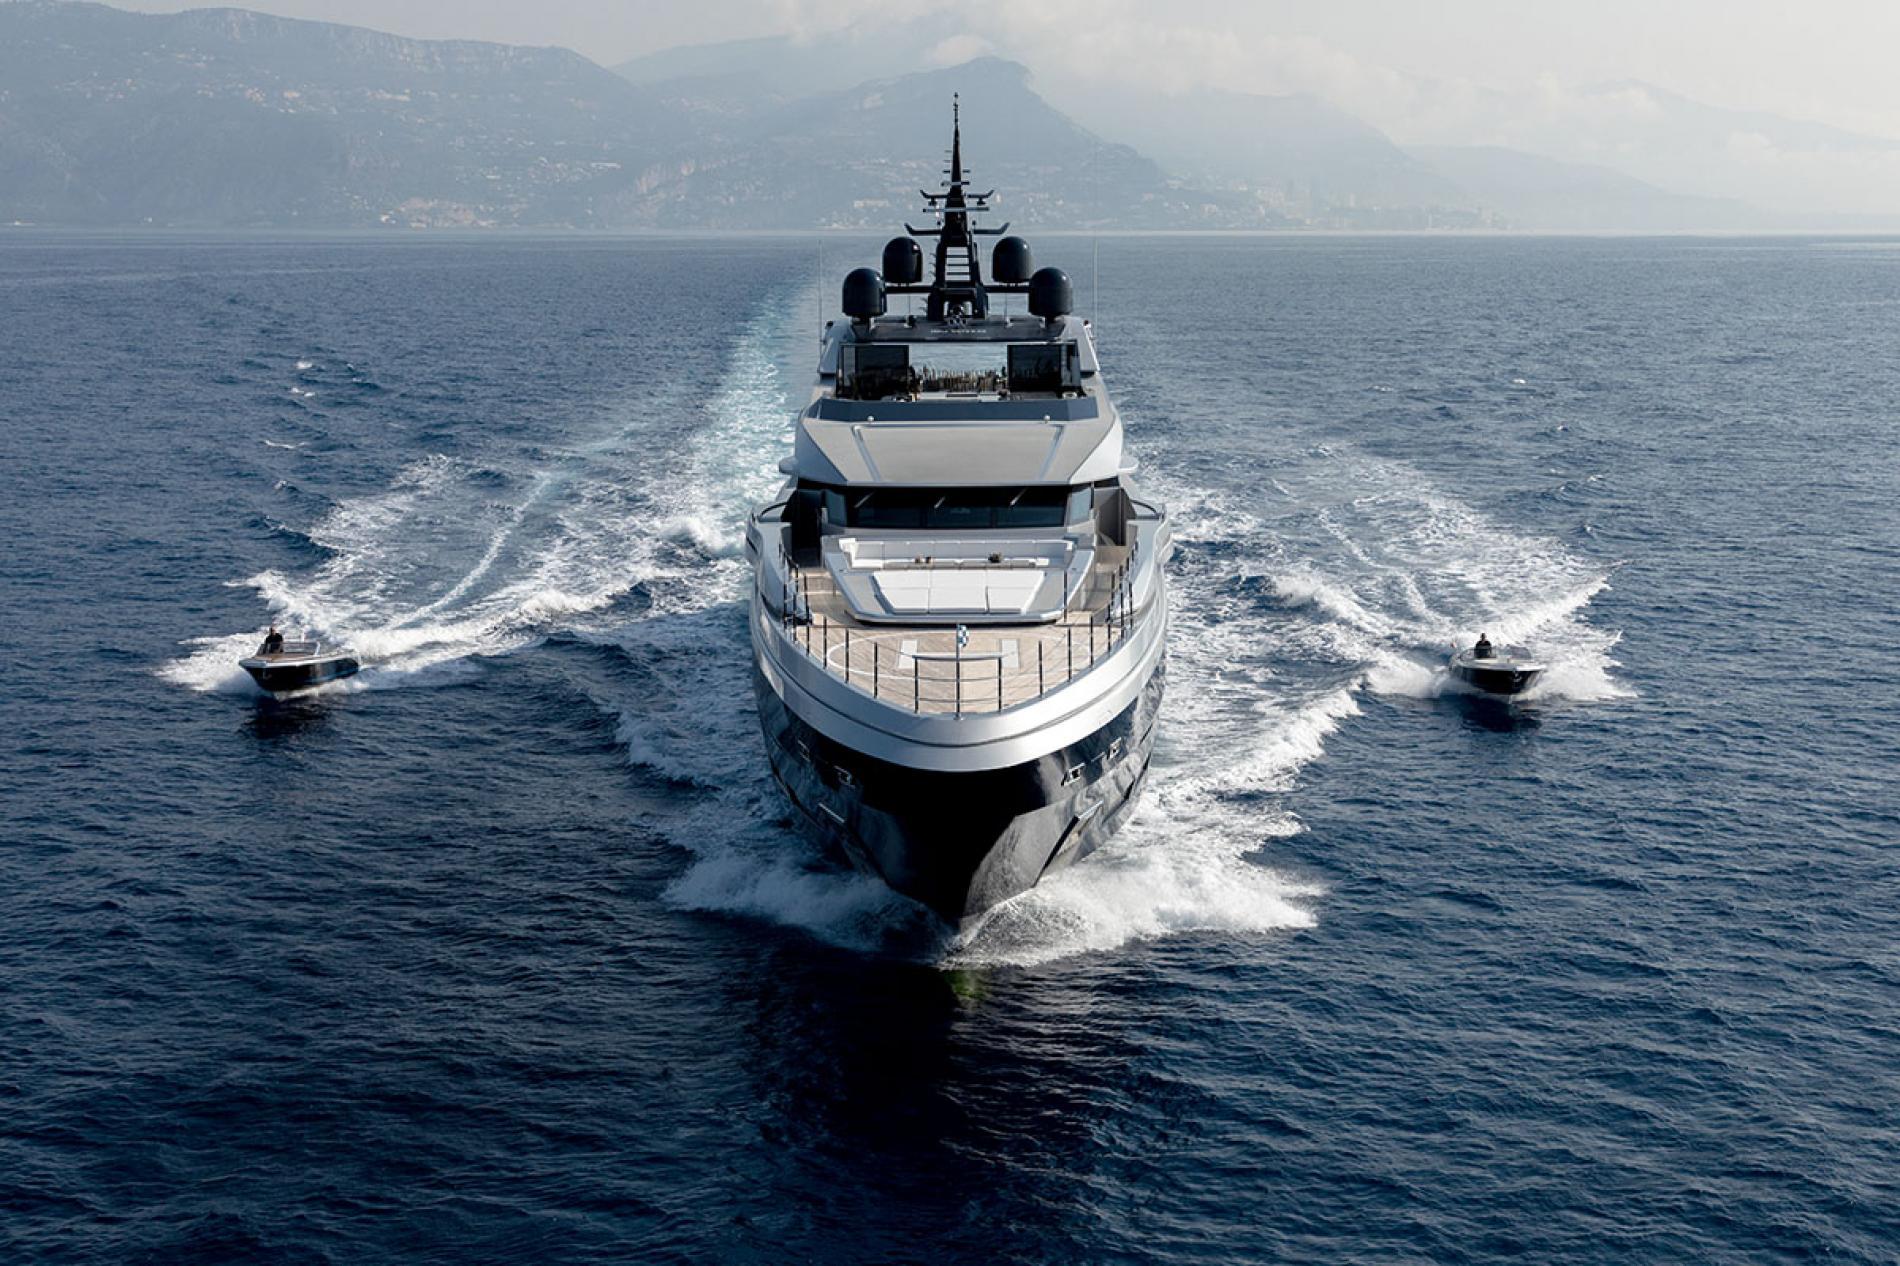 SARASTAR - Luxury Motor Yacht For Sale - Exterior Design - Img 1 | C&N